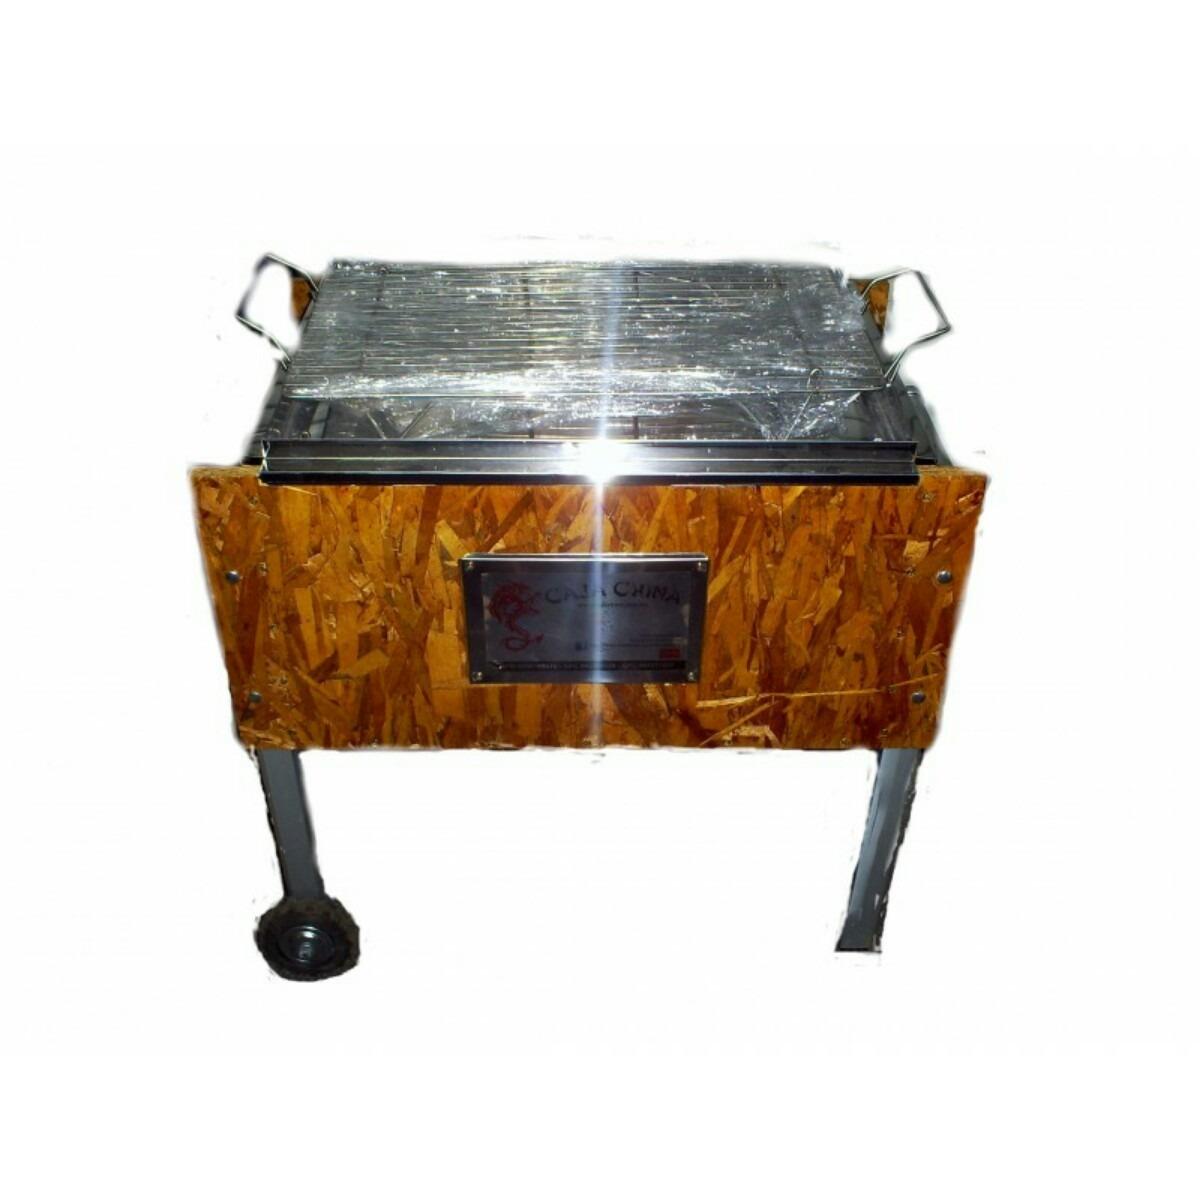 Caja China De Acero Inoxidable S 490 00 En Mercado Libre